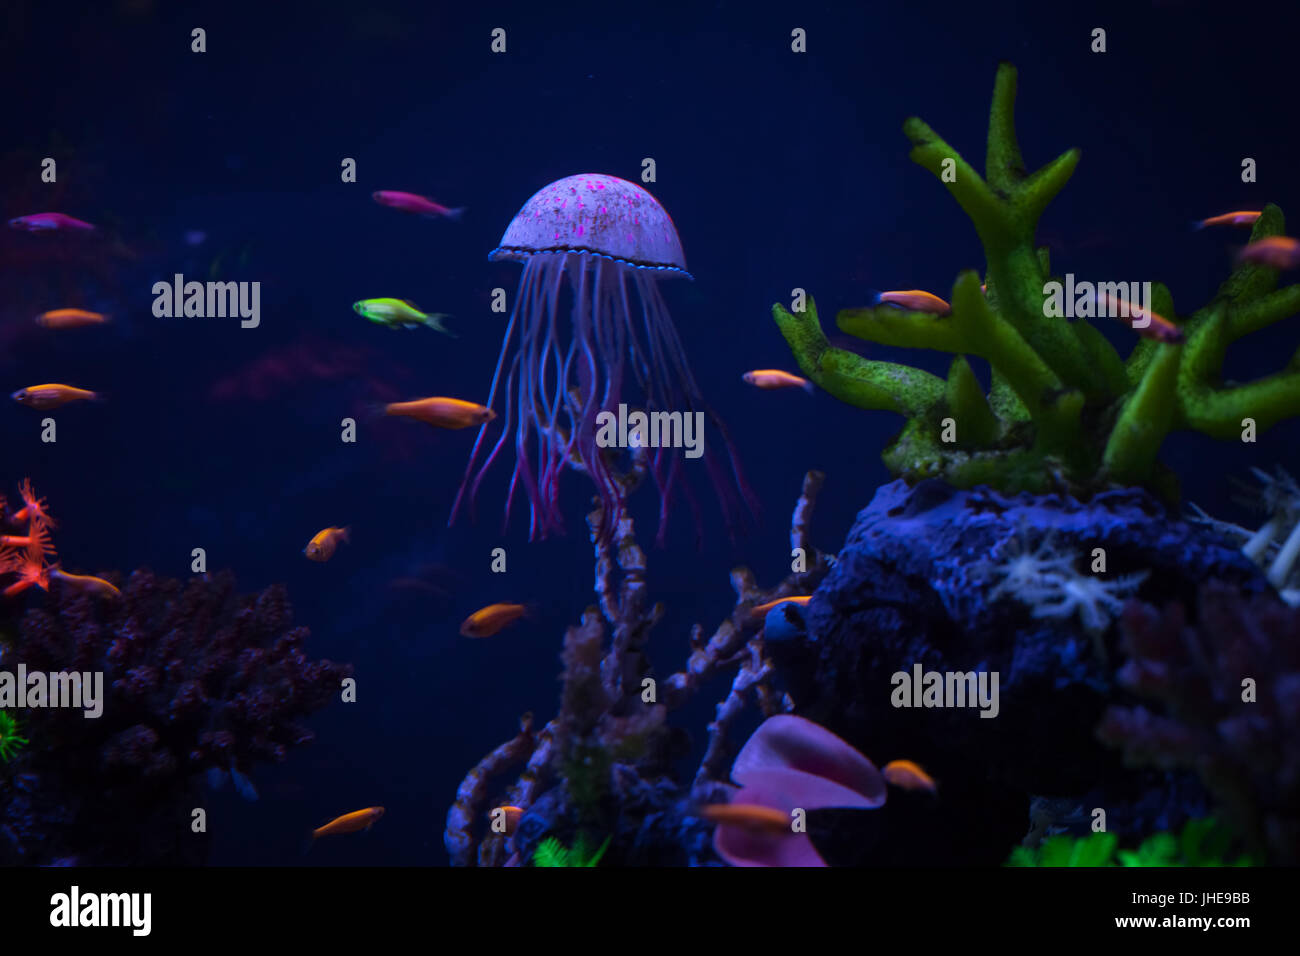 Beautiful jellyfish under water among corals, close up - Stock Image